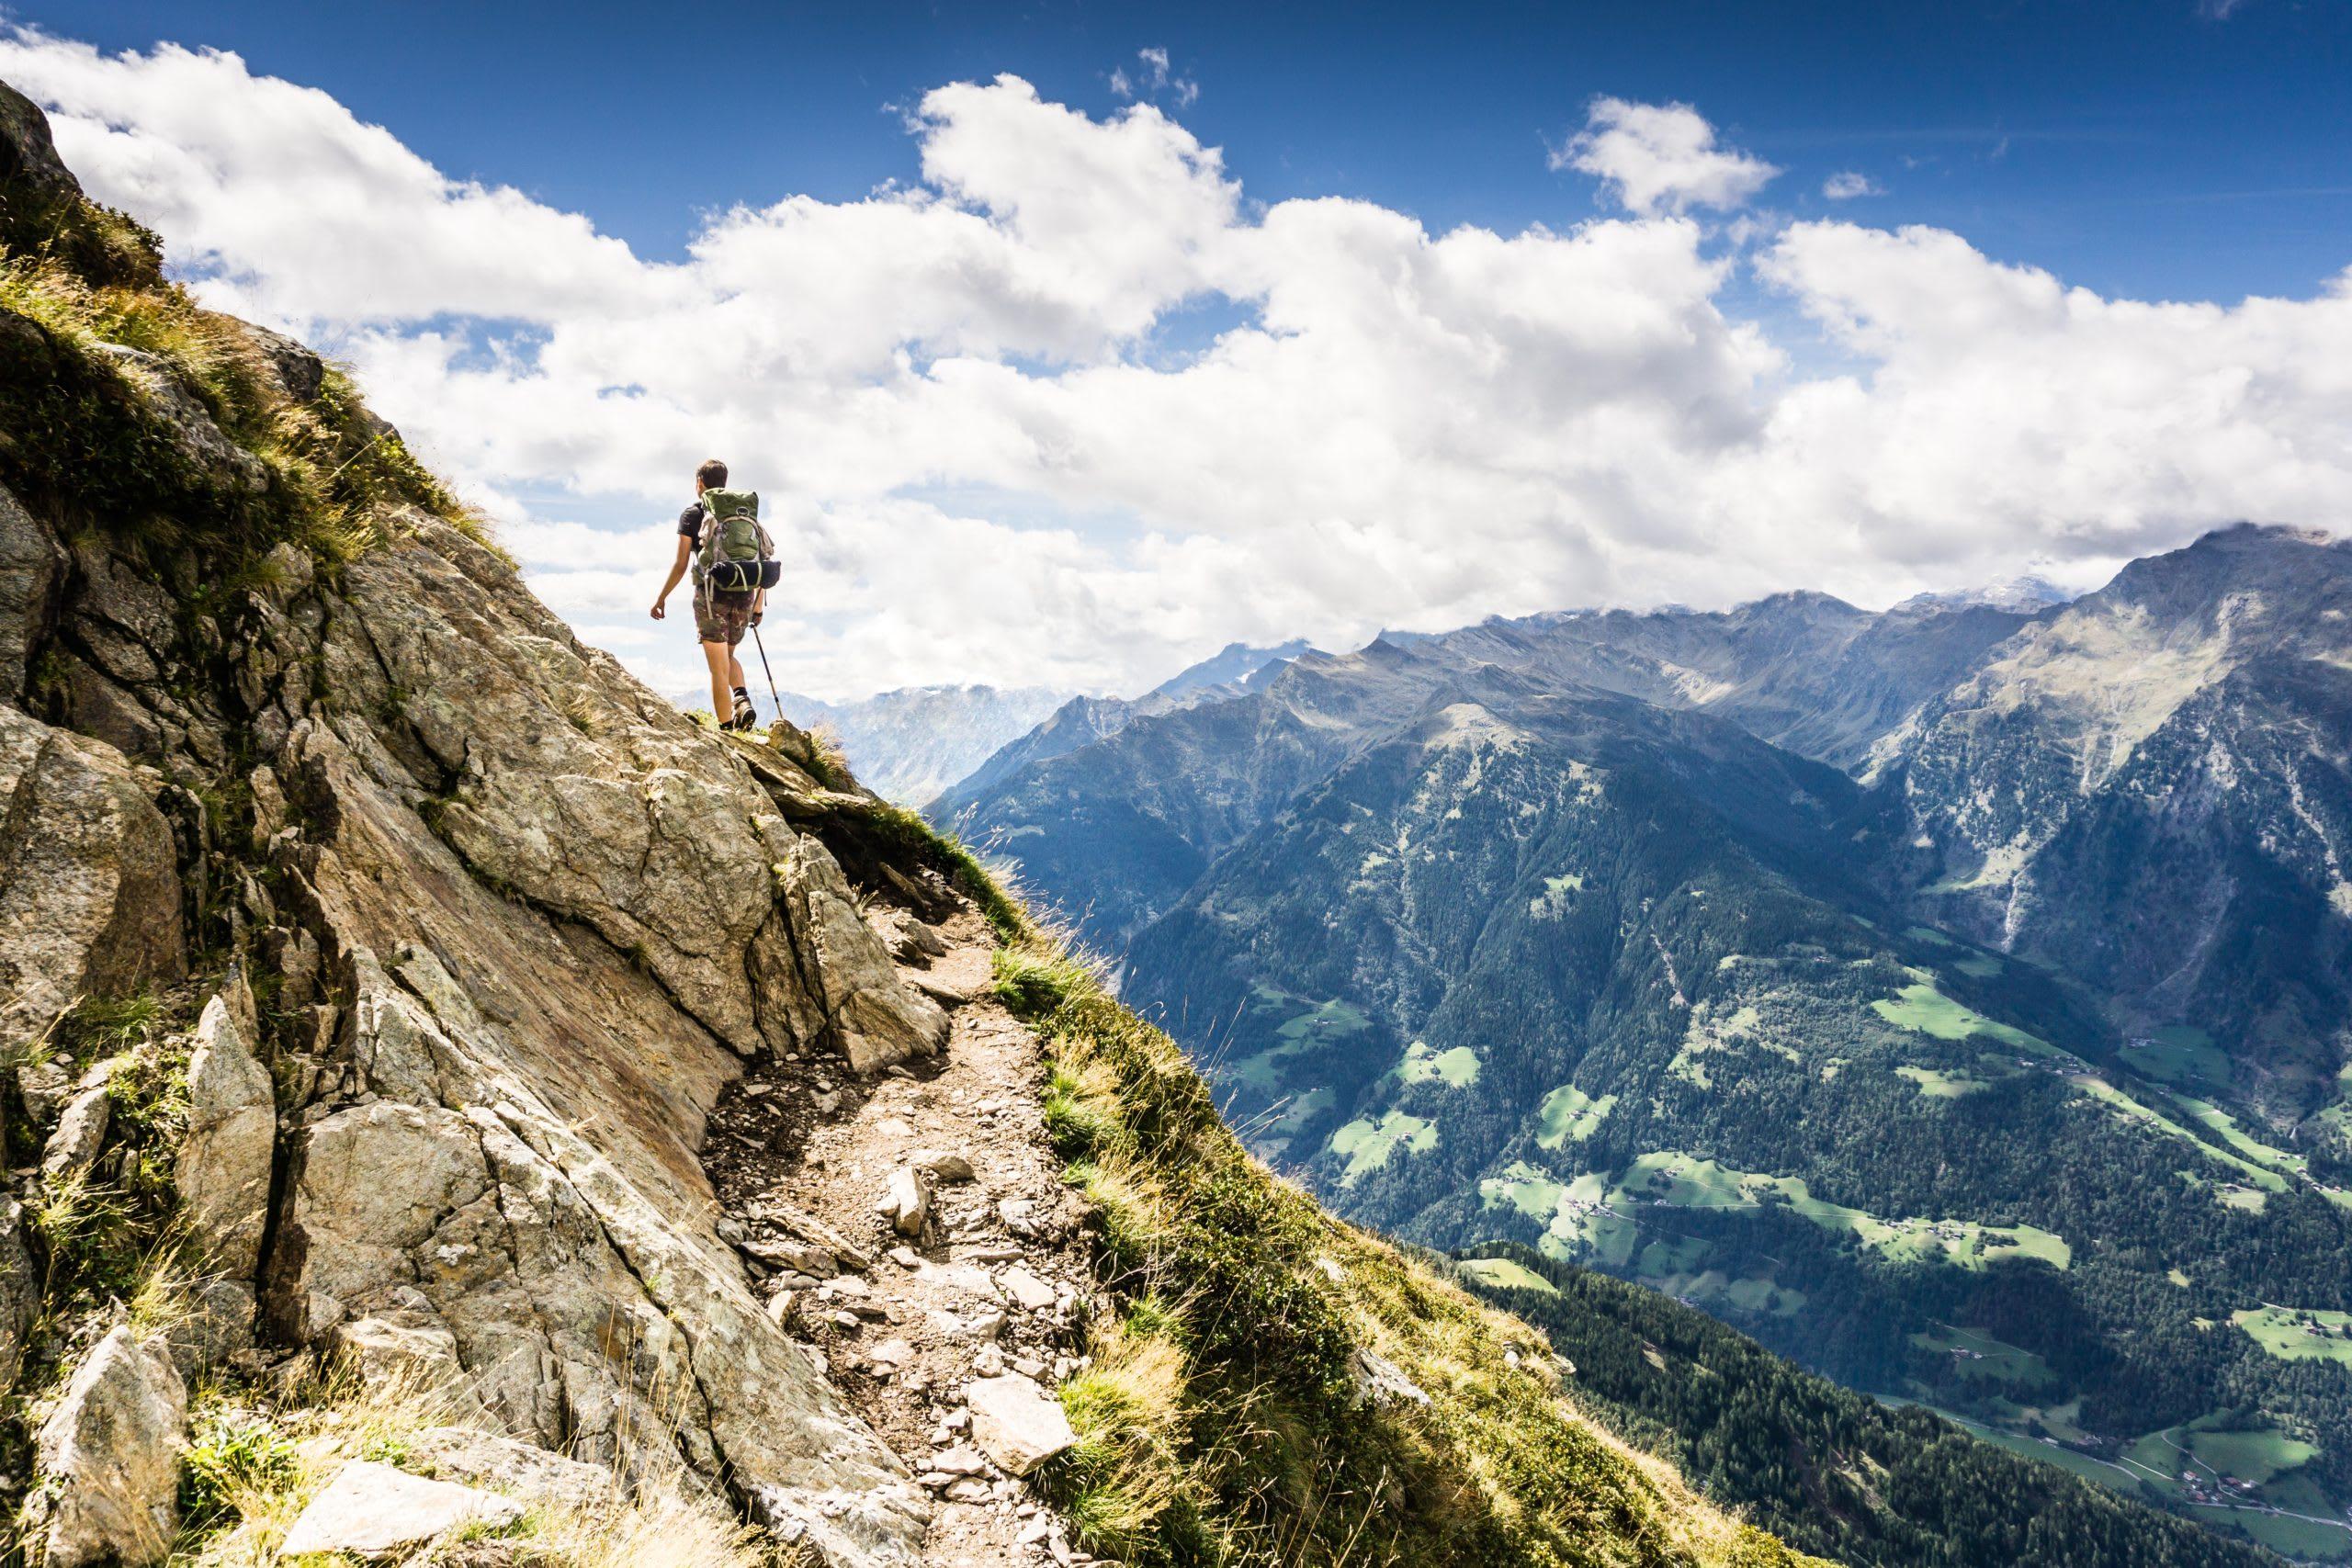 man_hiking_in_a_mountain